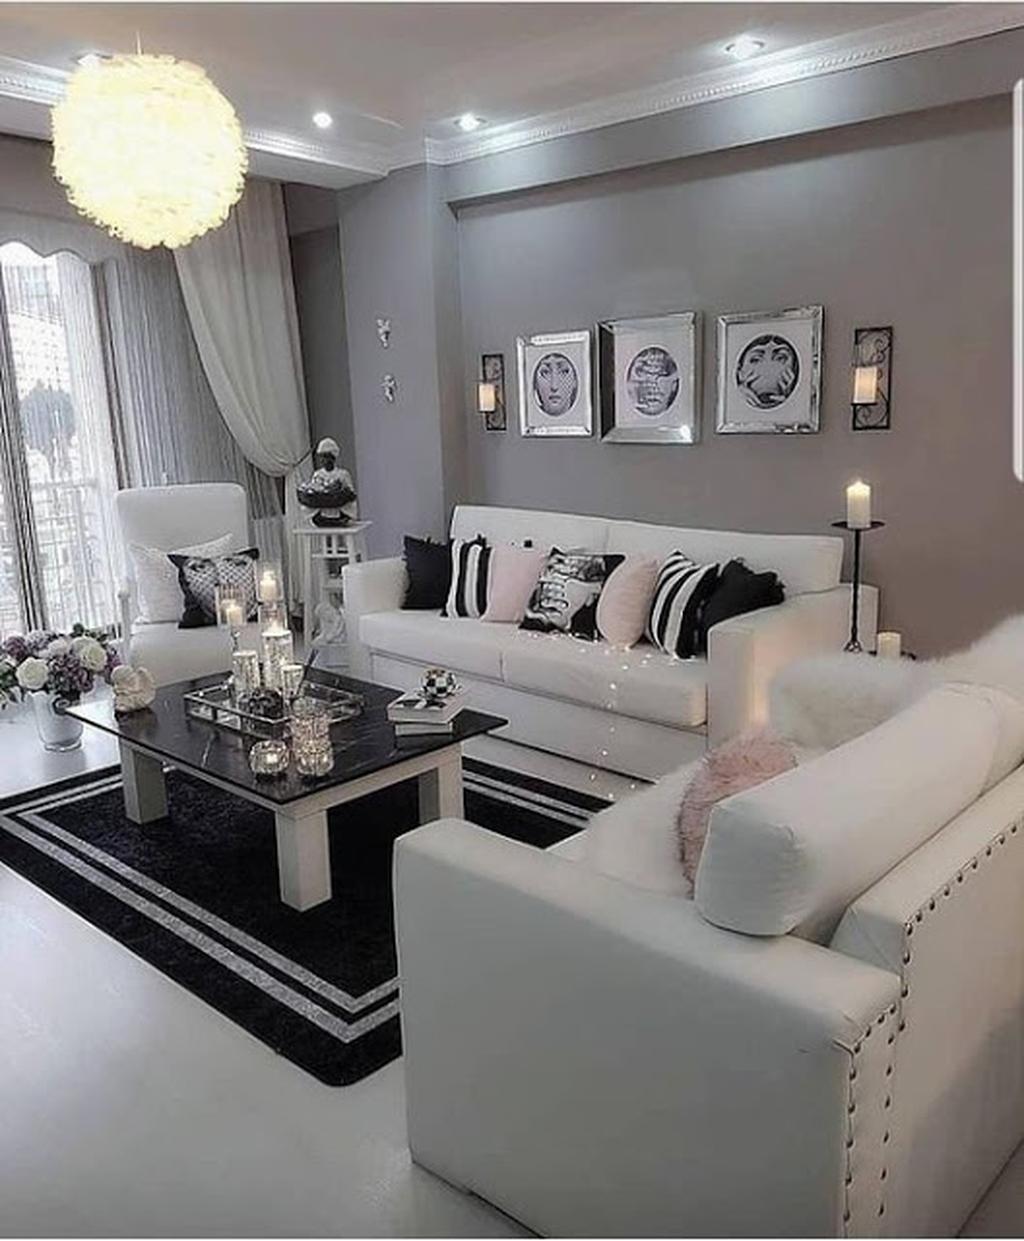 31 Admirable Cozy Living Room Decor Ideas Trendehouse Living Room Decor Cozy Elegant Living Room Decor Decor Home Living Room